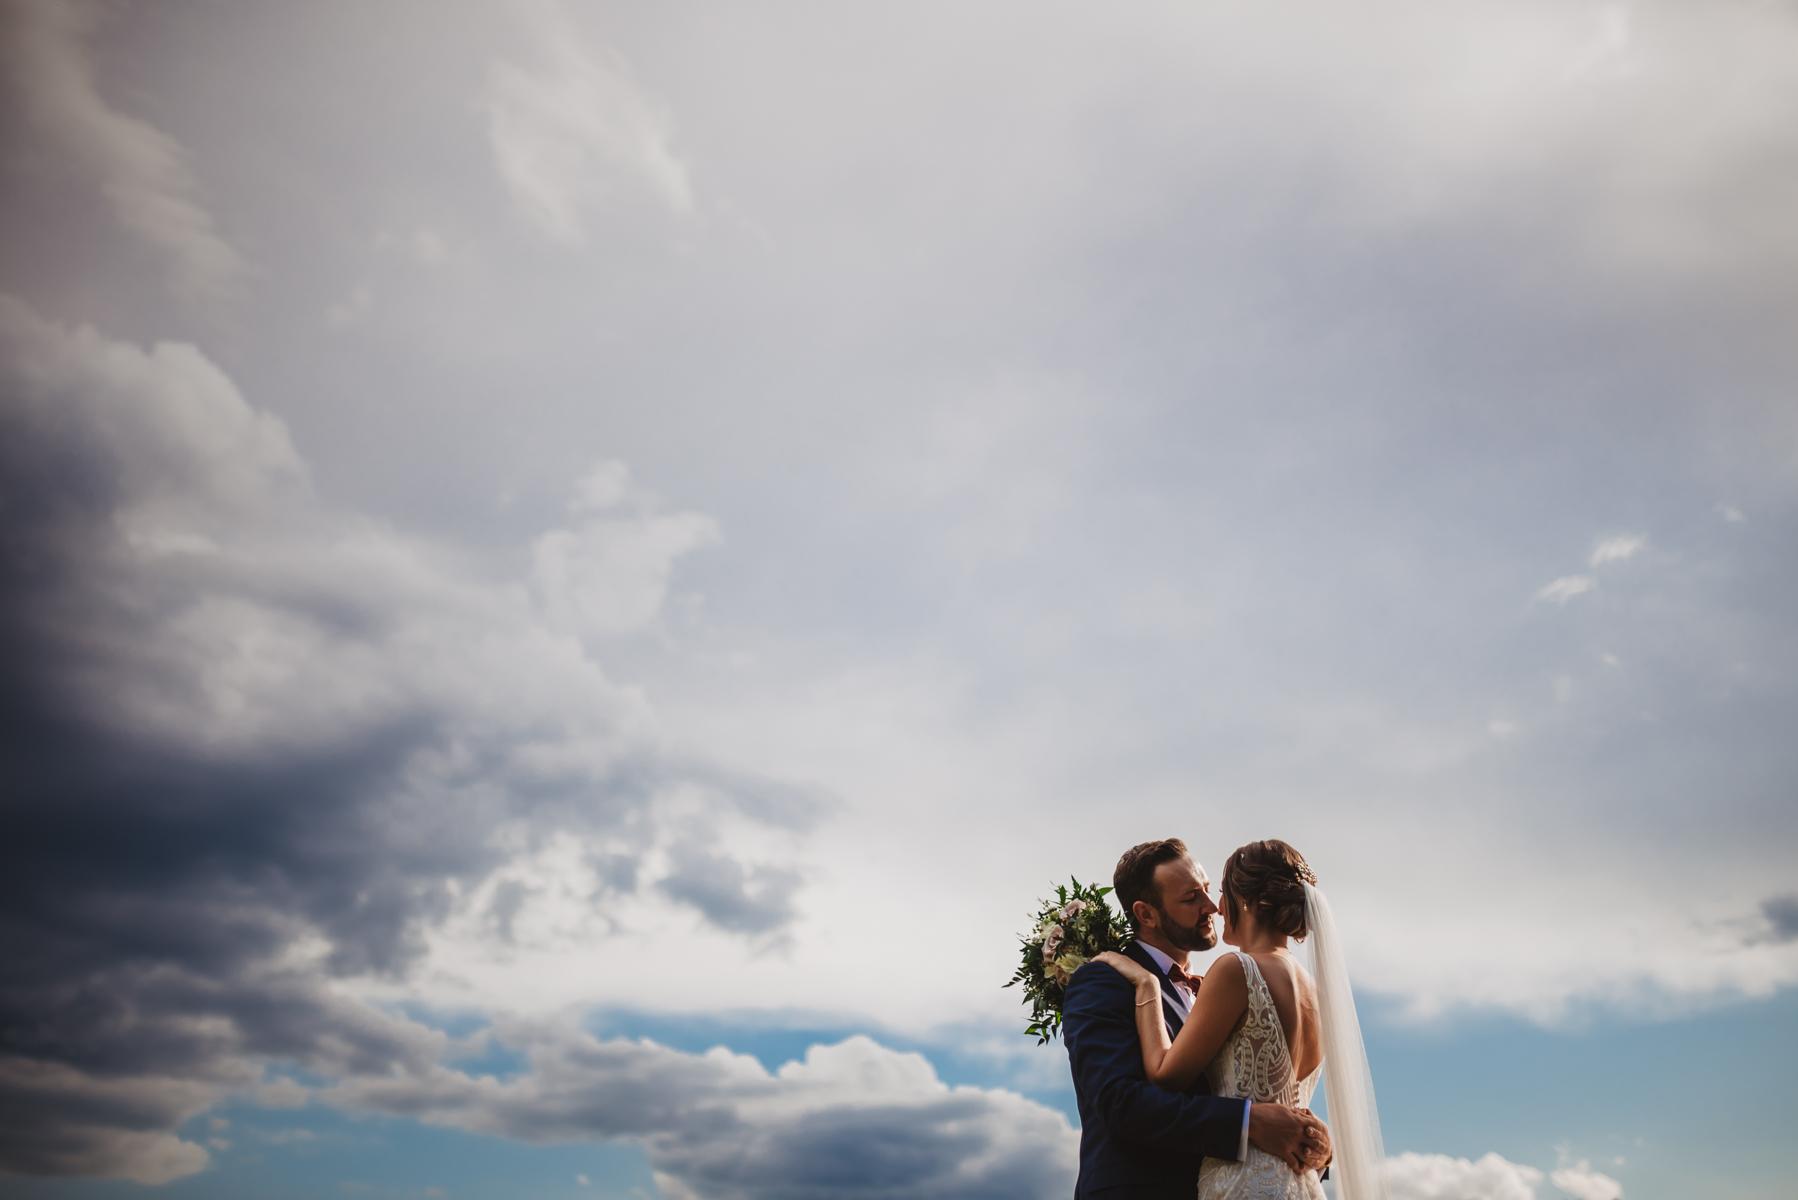 Wedding Villa I Cedri Lucca Photographer Marco Vegni